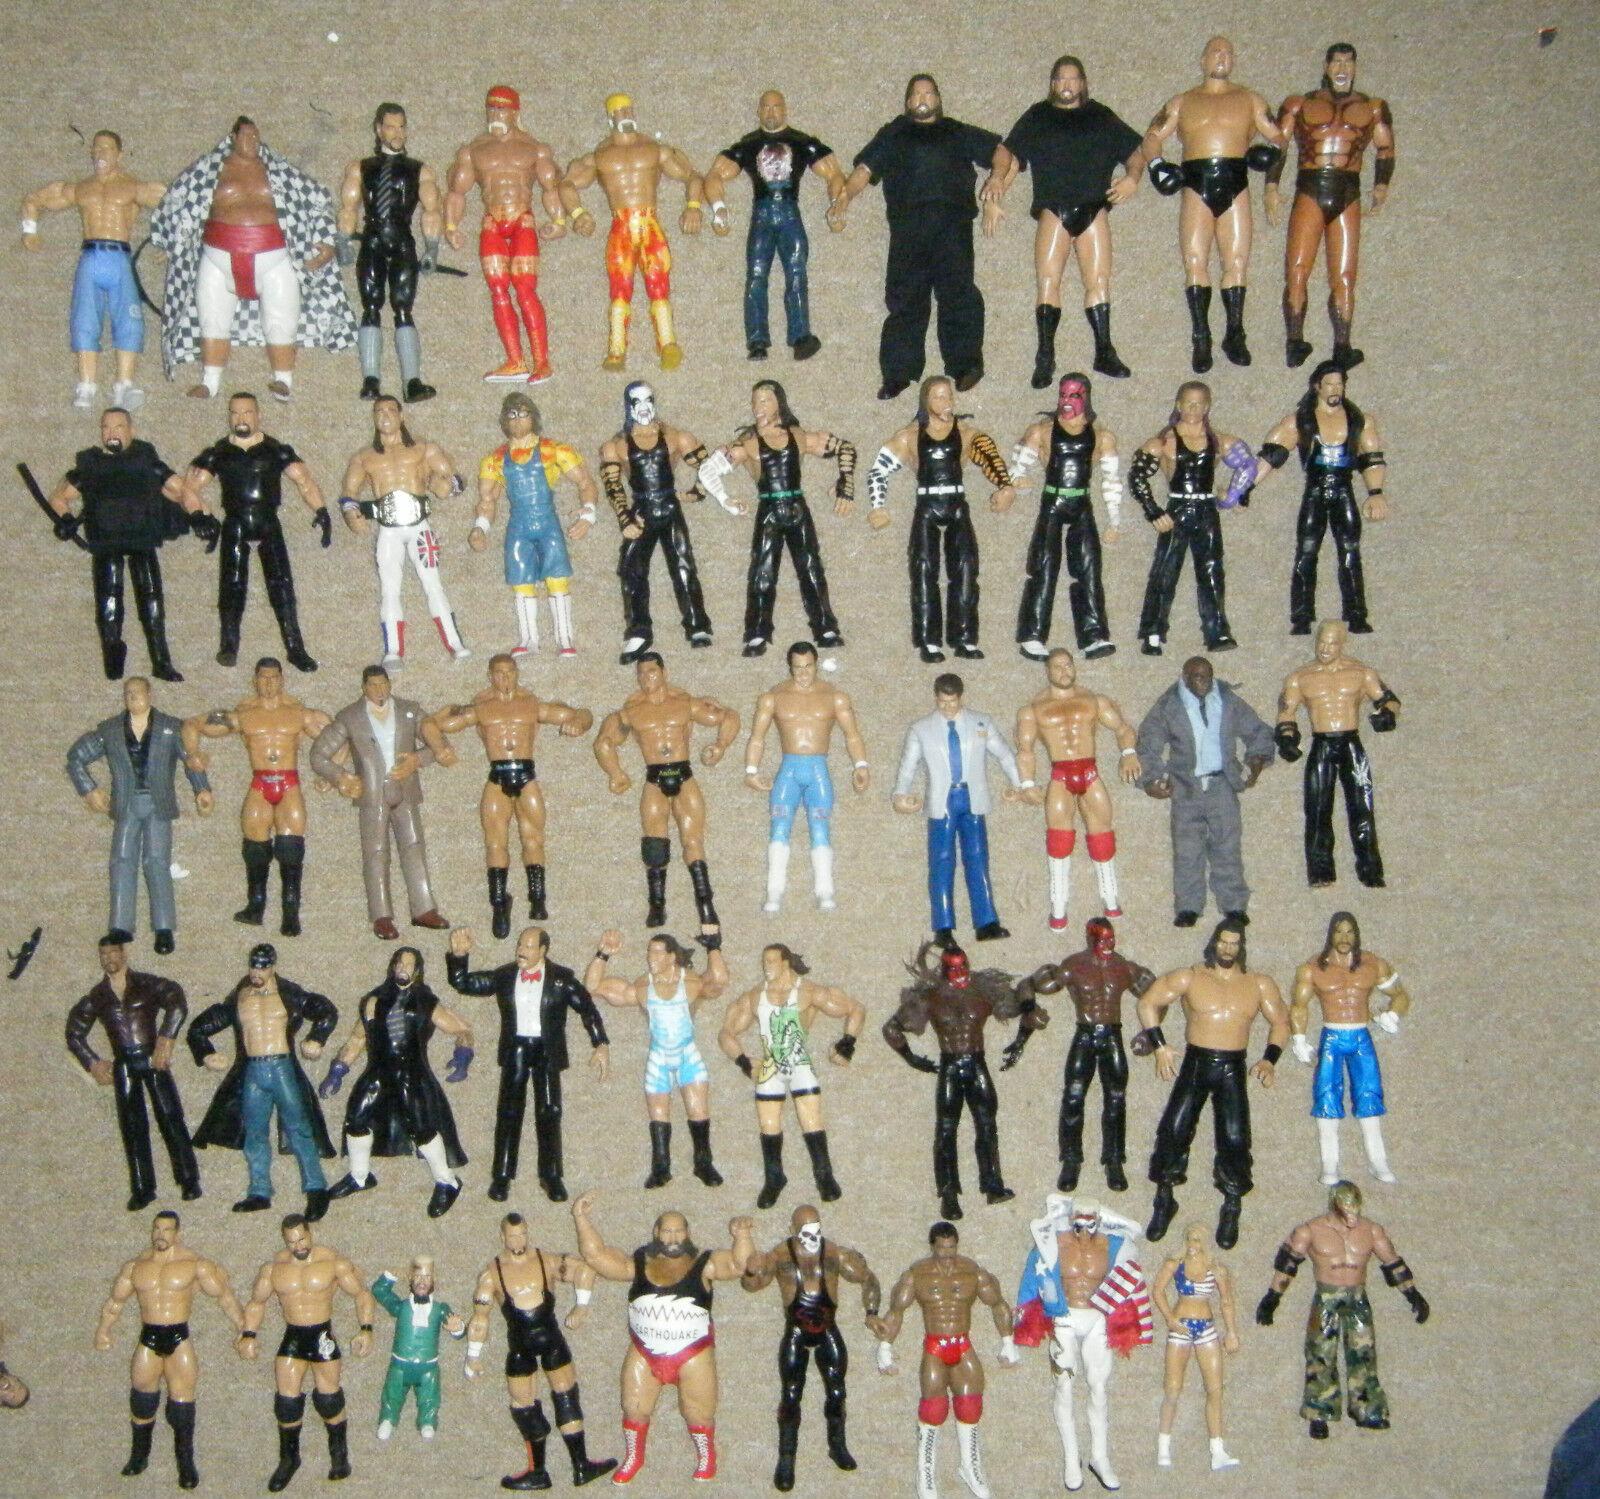 WWE WRESTLING ACTION FIGURE SERIES CLASSIC SERIES DELUXE TNA IMPACT MATTEL WWF